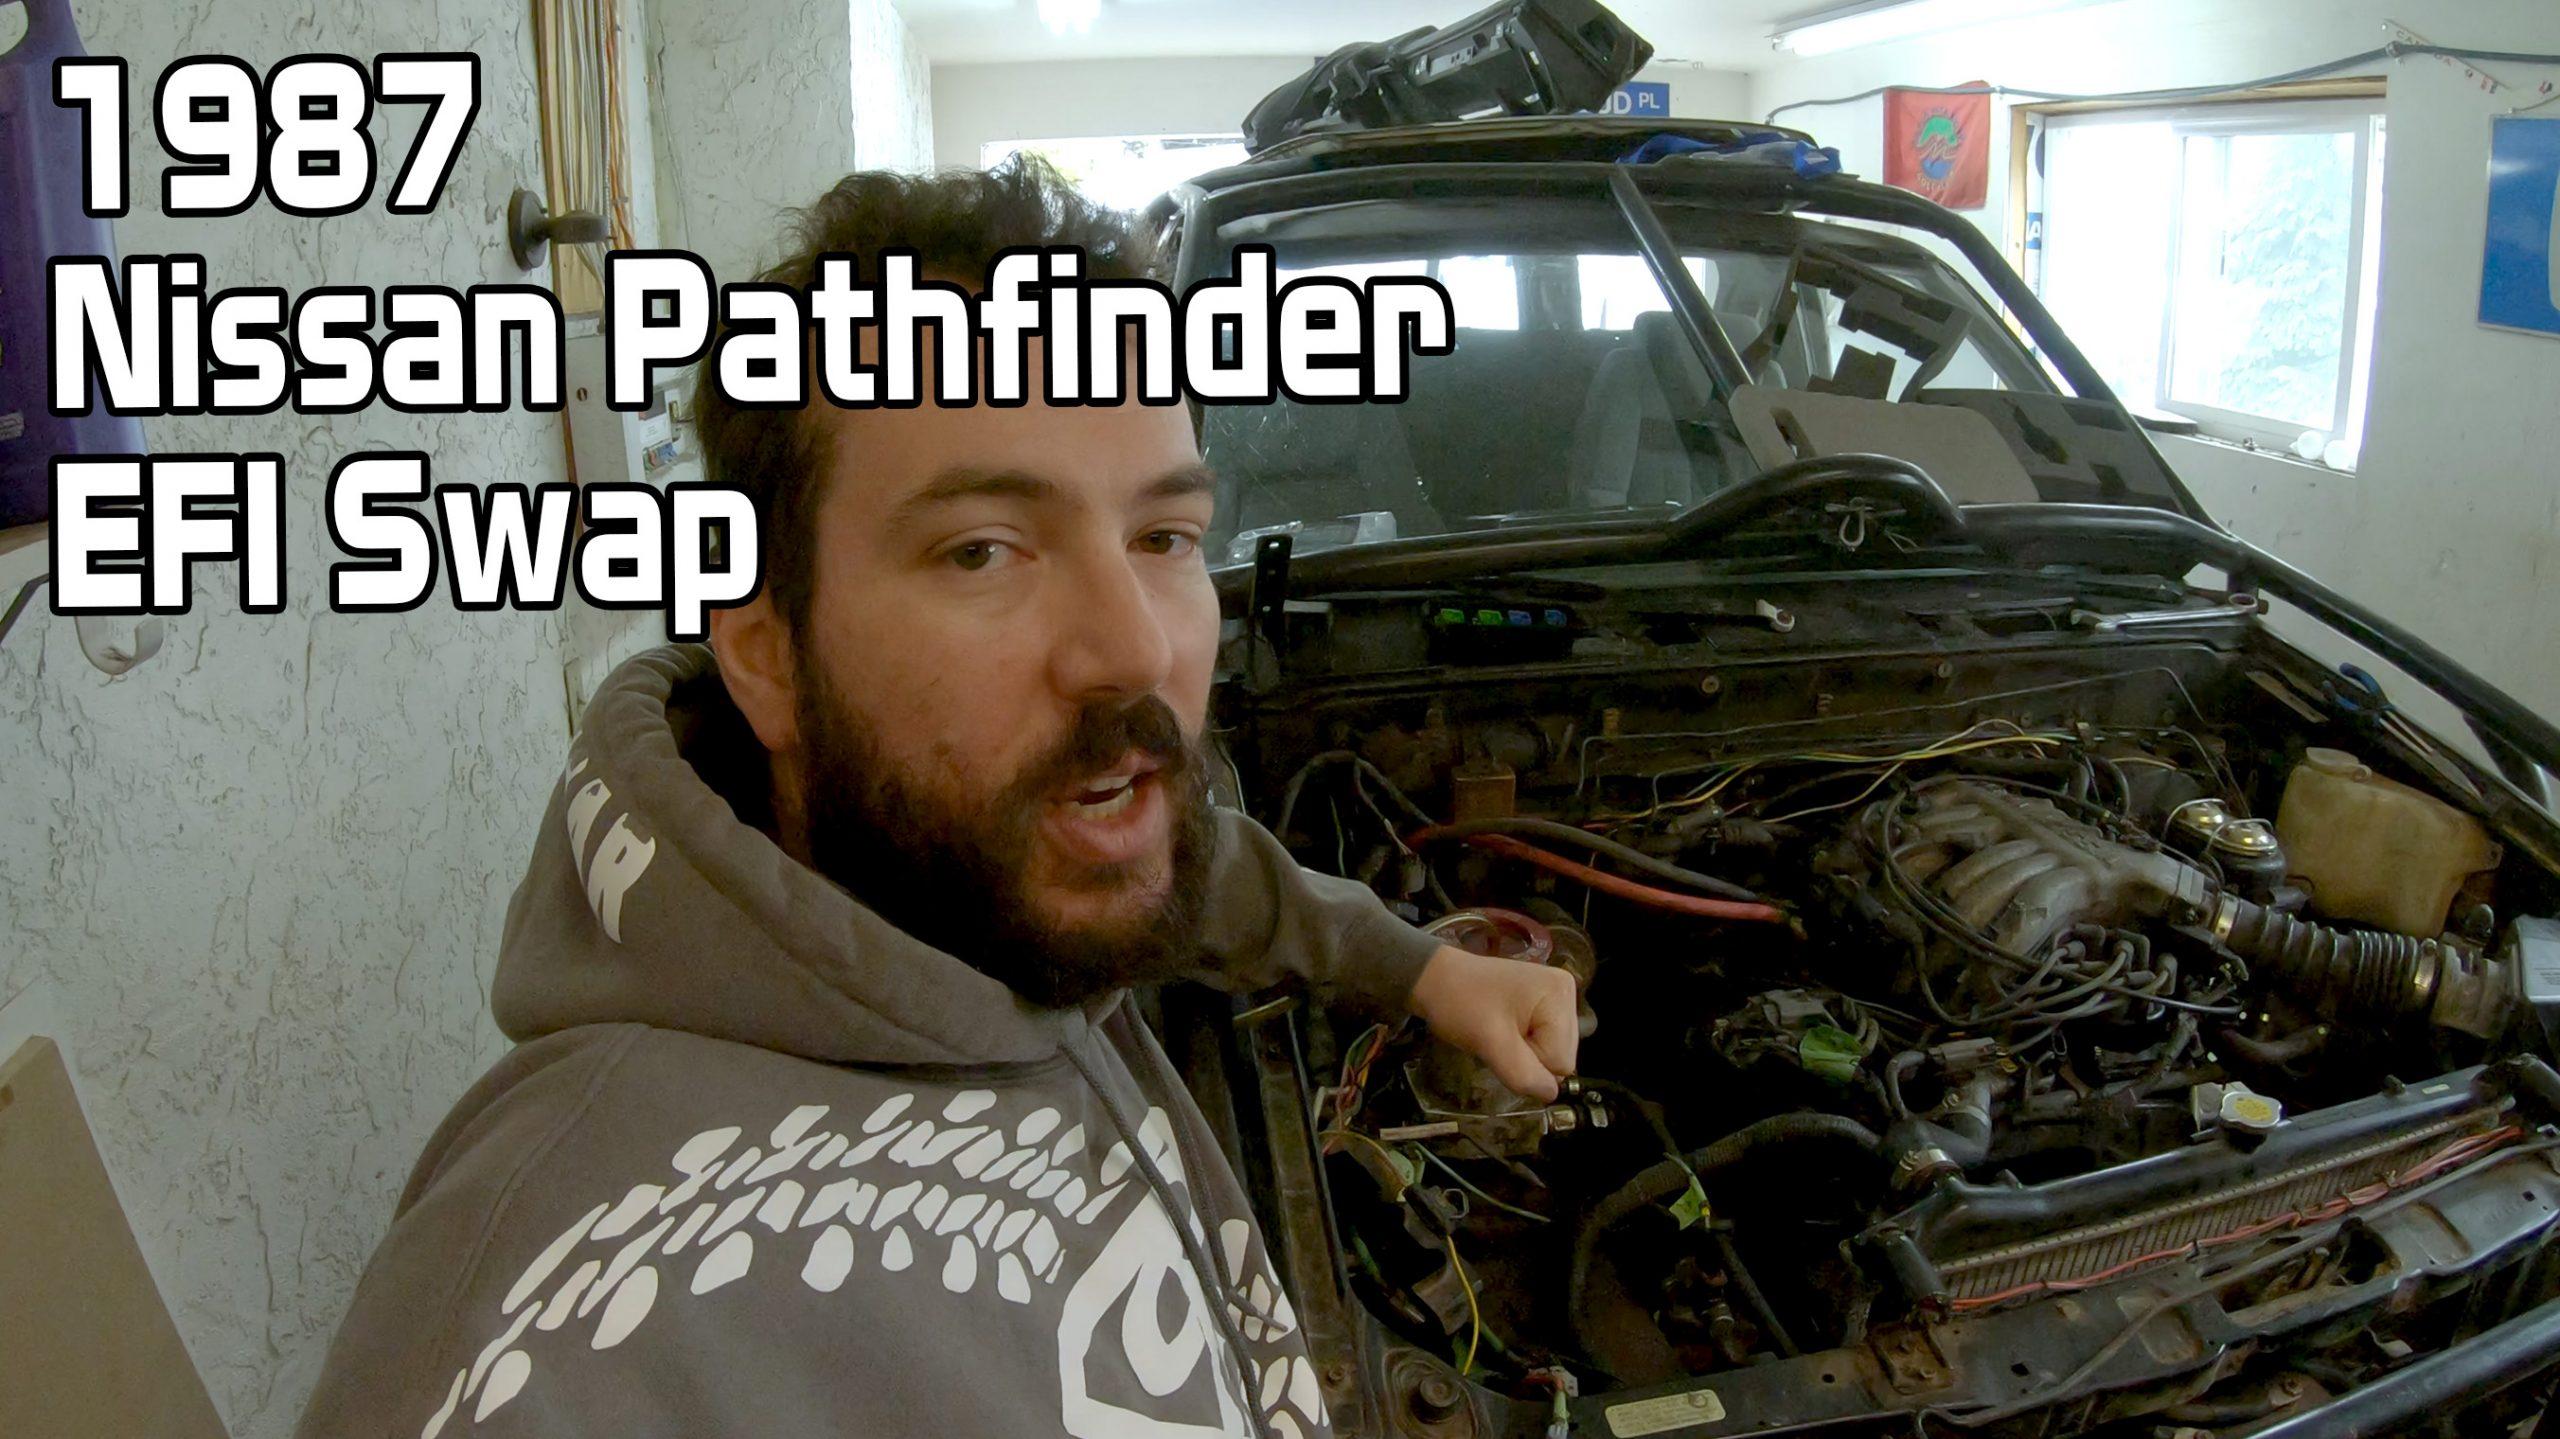 Nissan Pathfinder VG30i EFI Swap